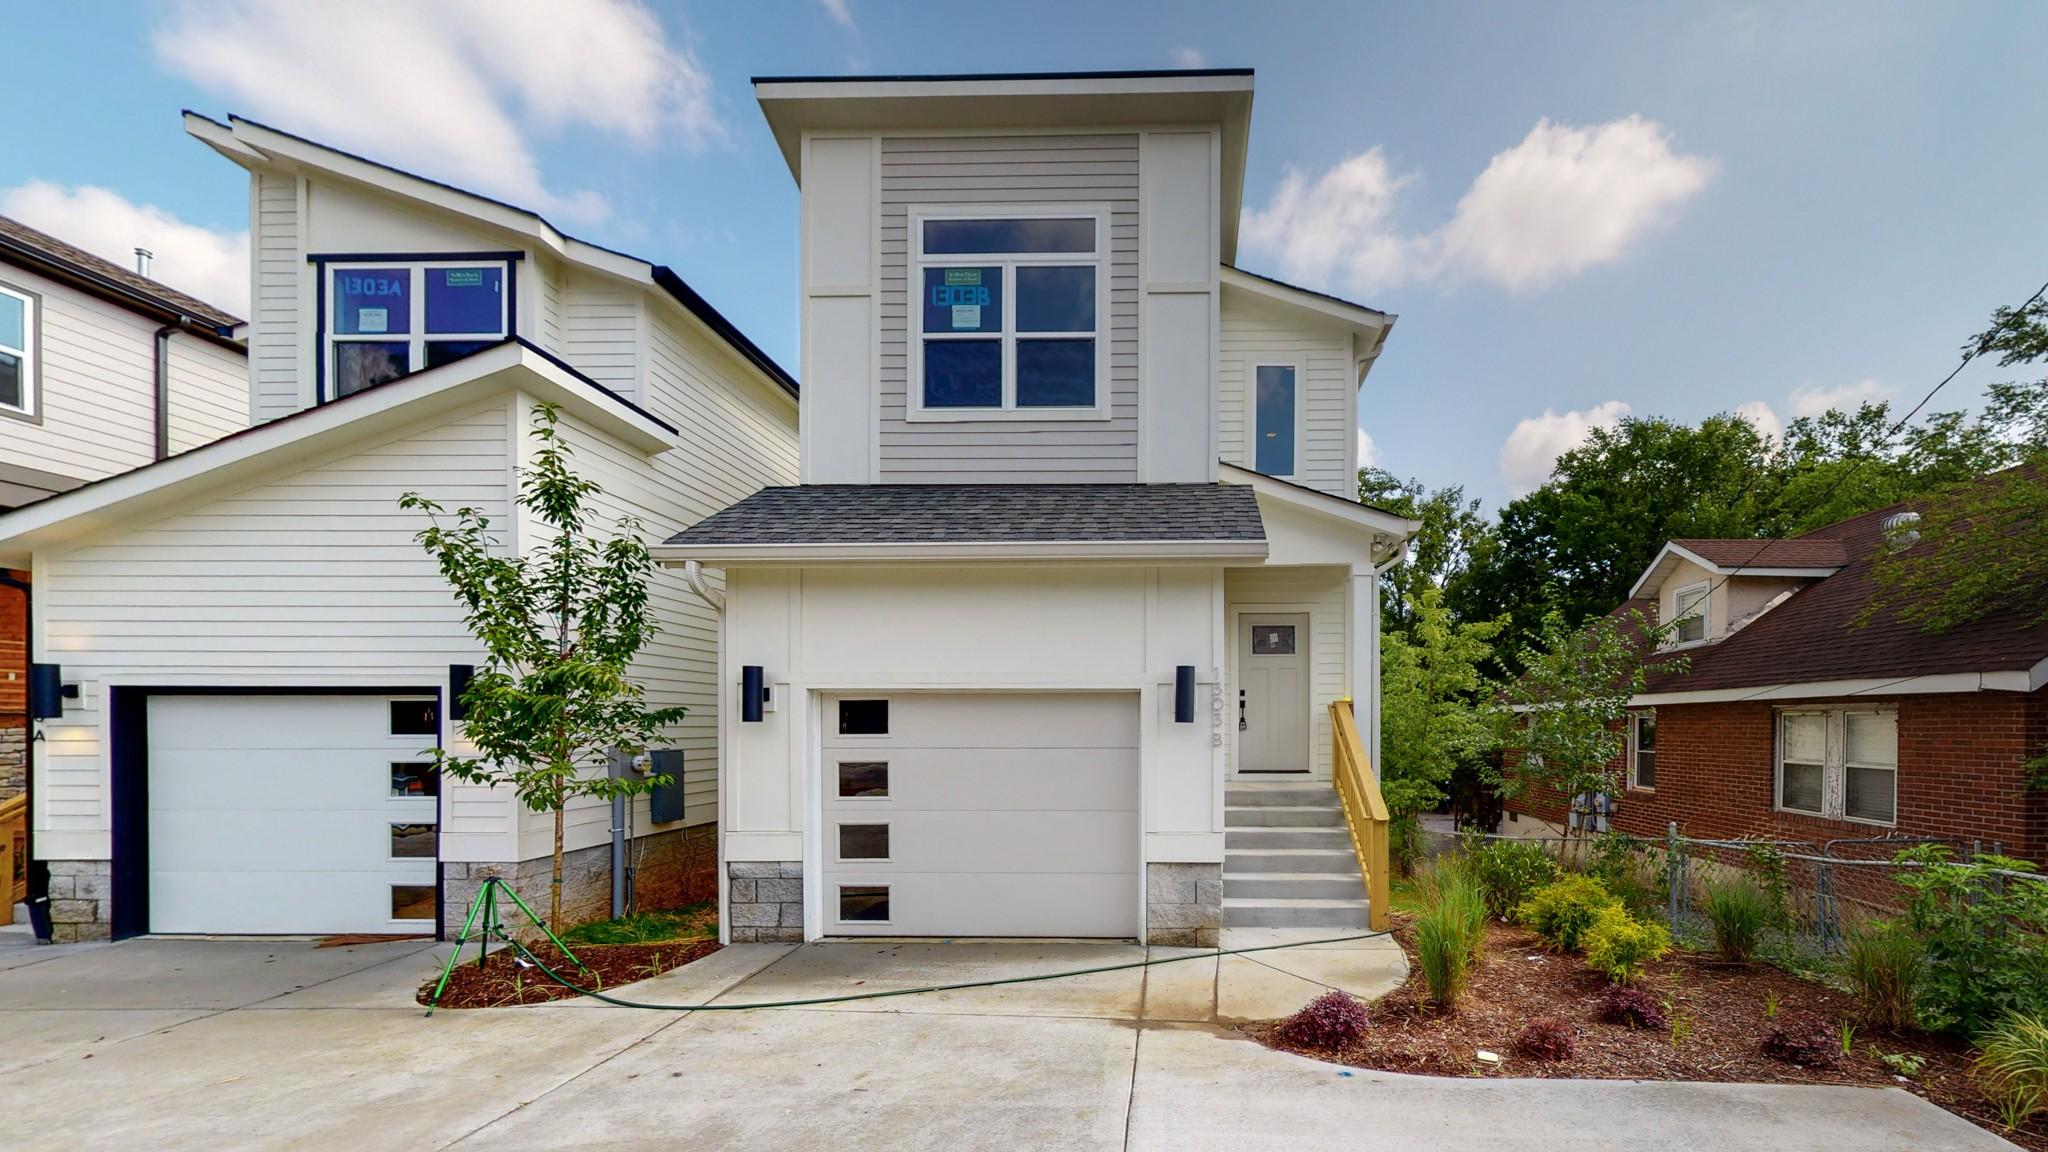 1303B Litton Ave Property Photo - Nashville, TN real estate listing